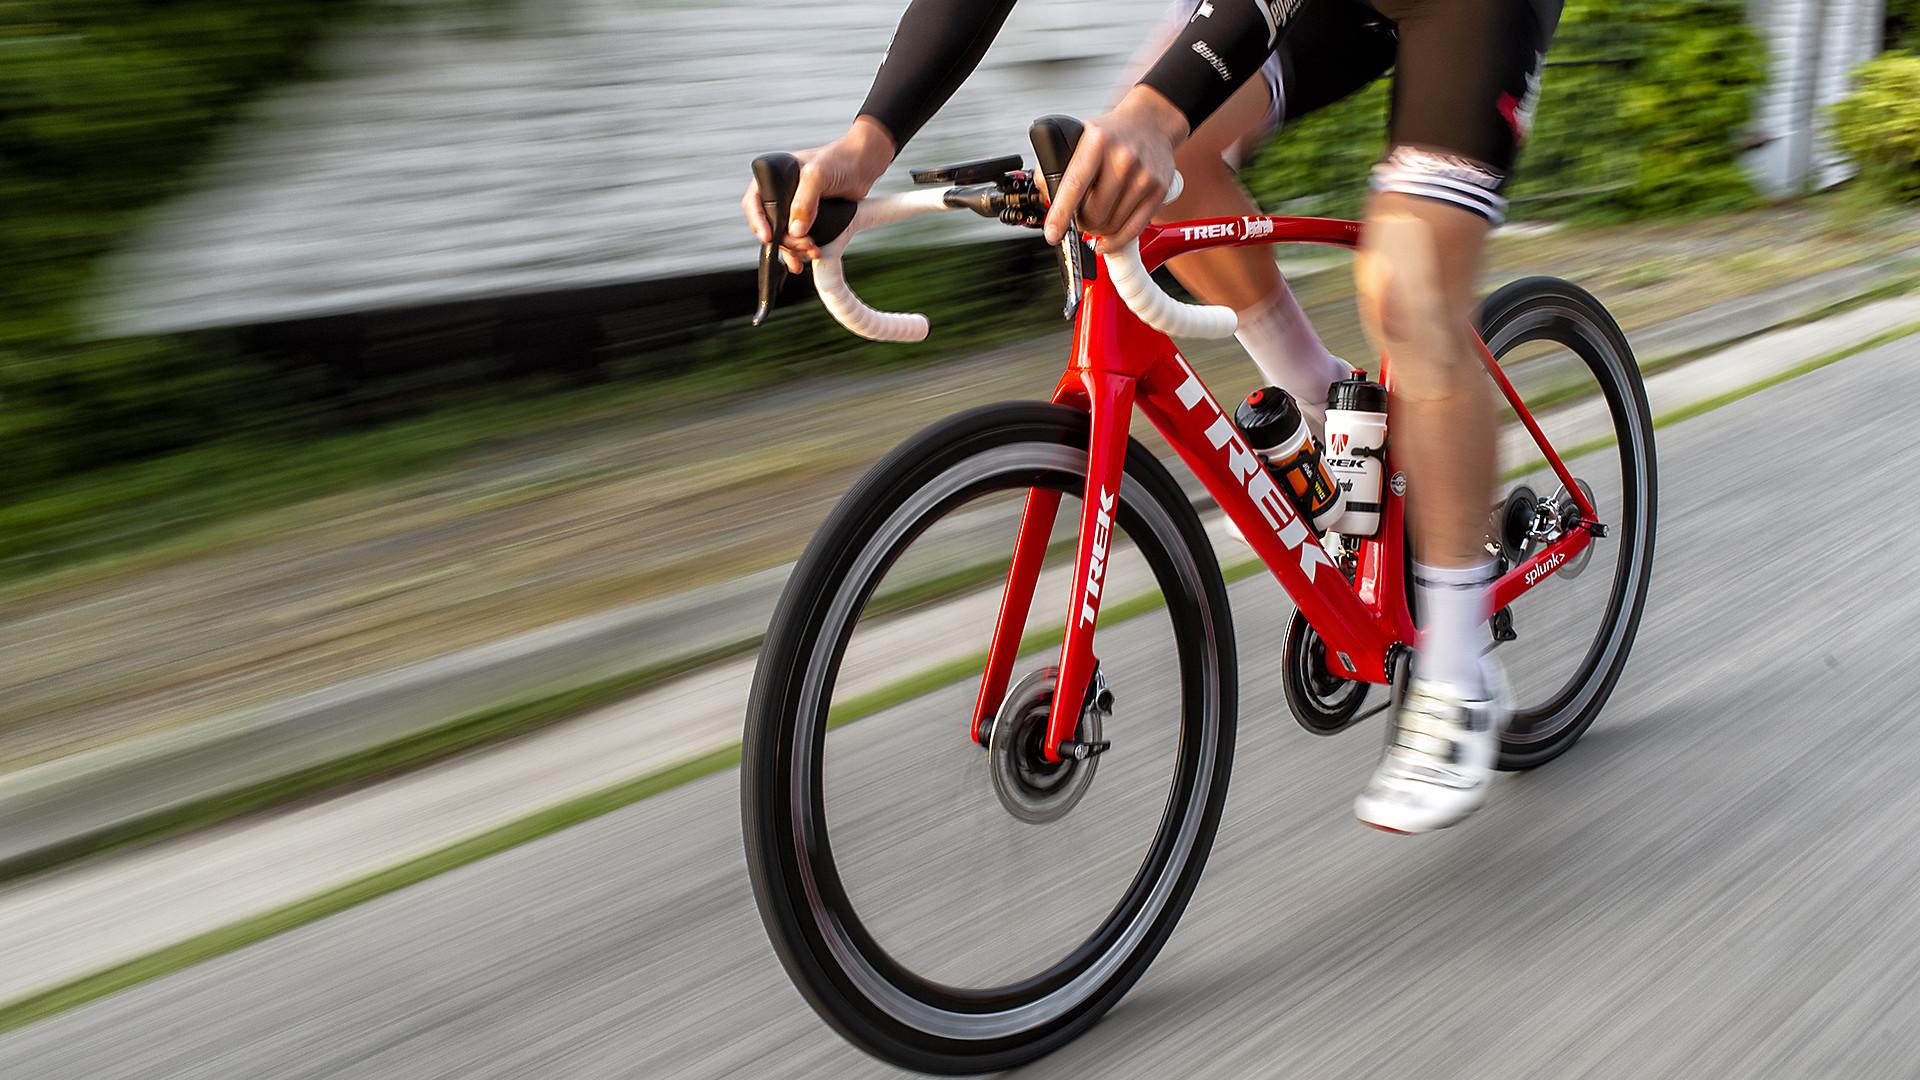 Trek Bikes - The world's best bikes and cycling gear | Trek Bikes